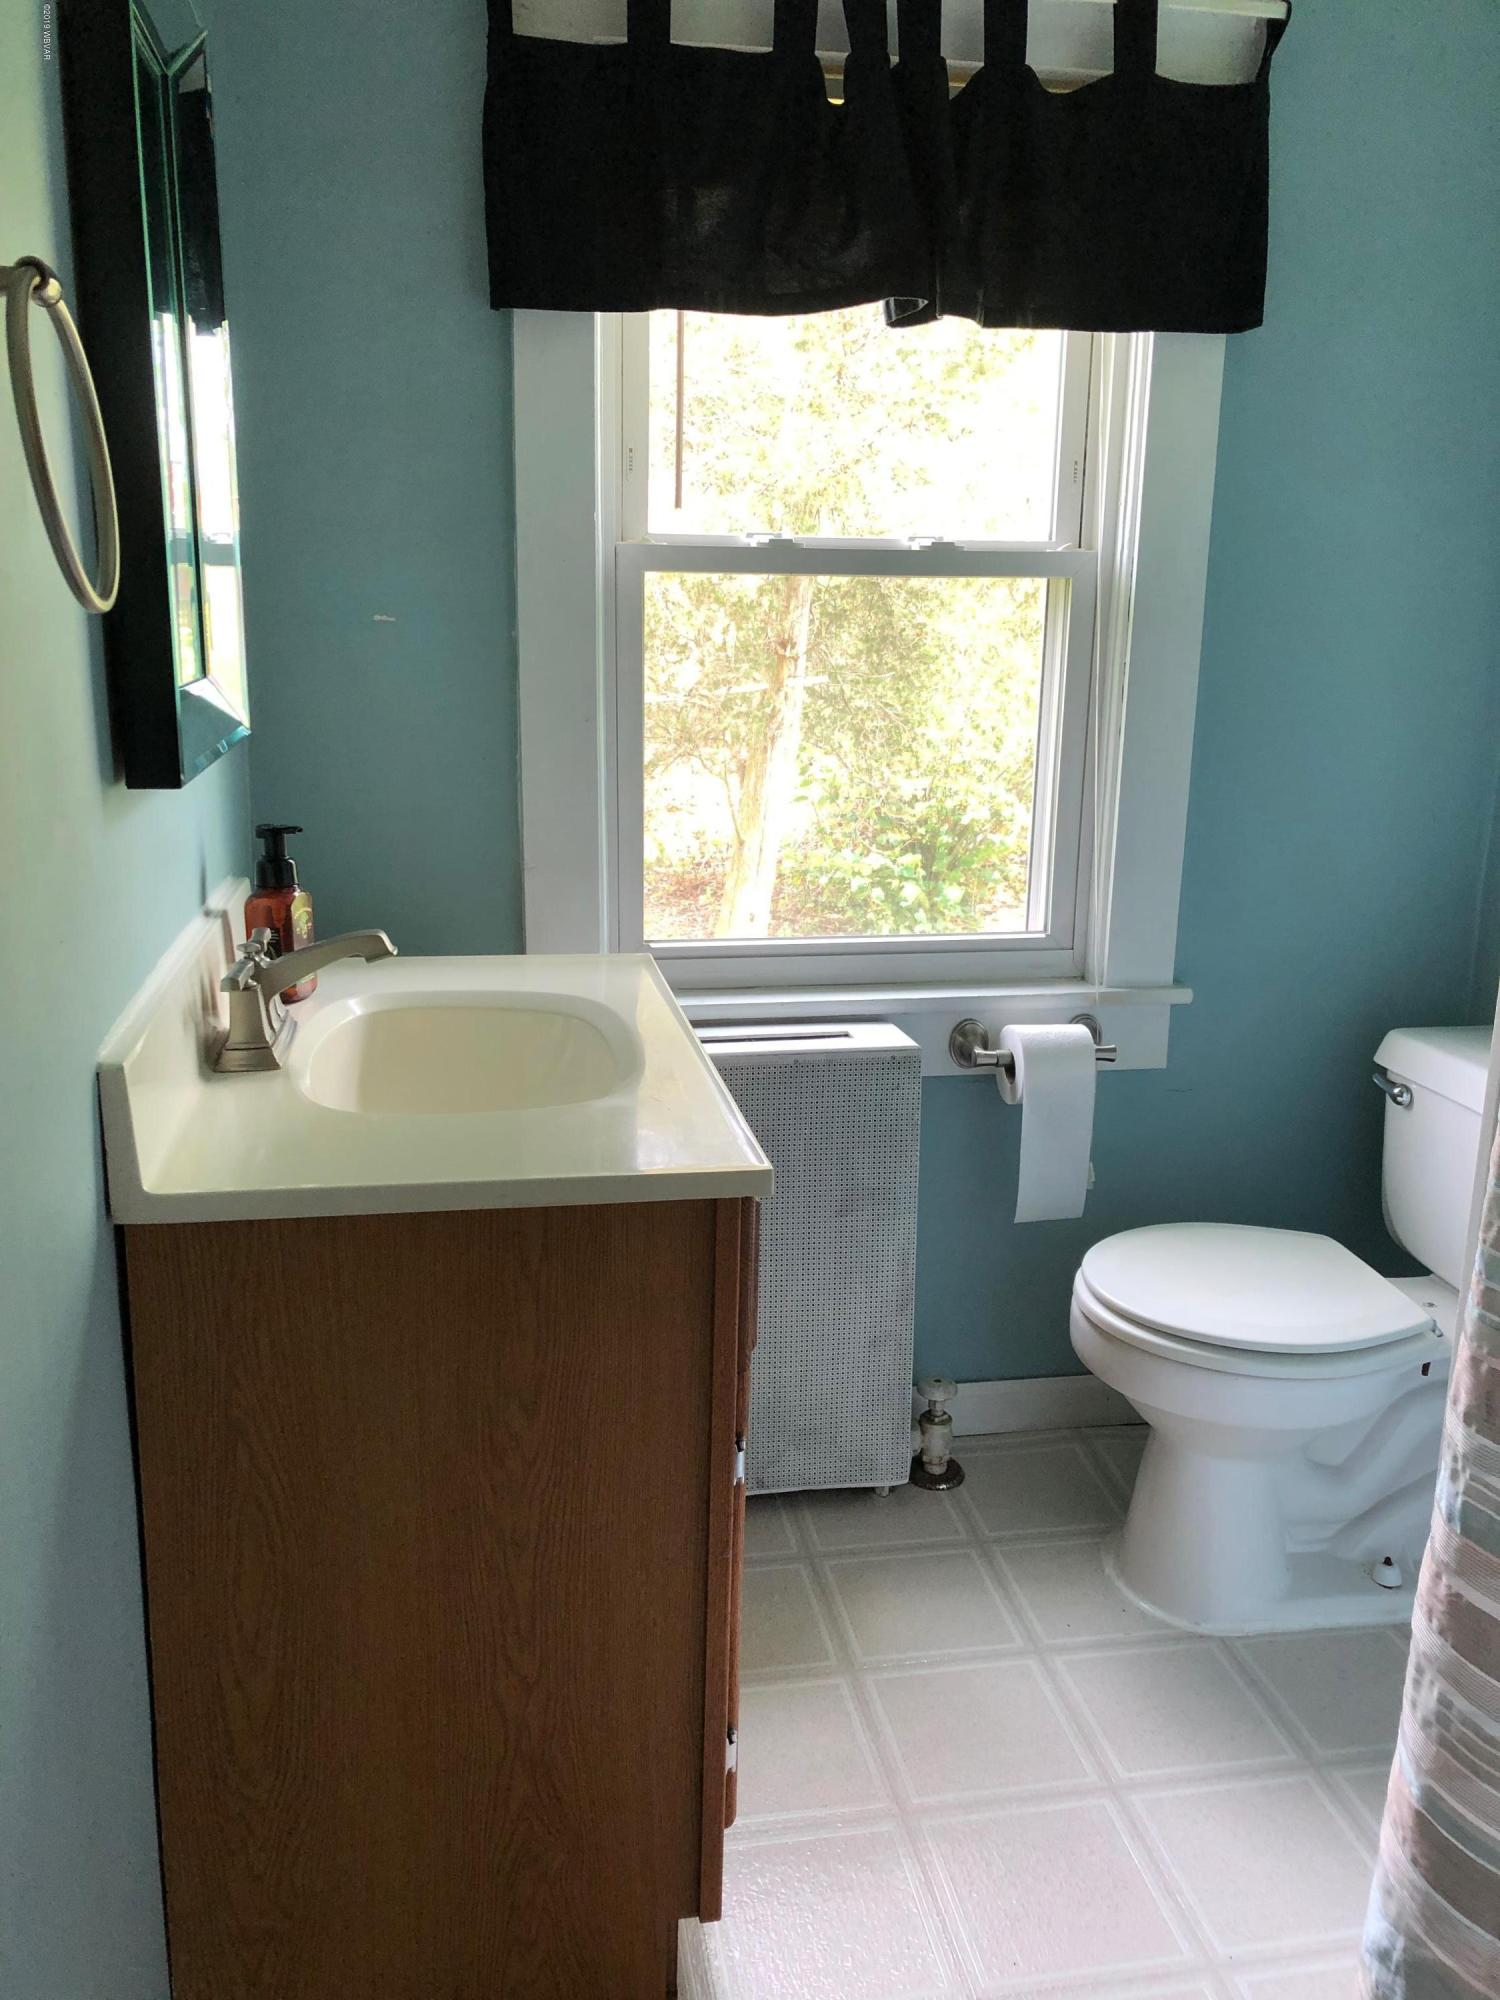 30 PRESERVE ROAD,Danville,PA 17821,4 Bedrooms Bedrooms,1.25 BathroomsBathrooms,Residential,PRESERVE,WB-87316